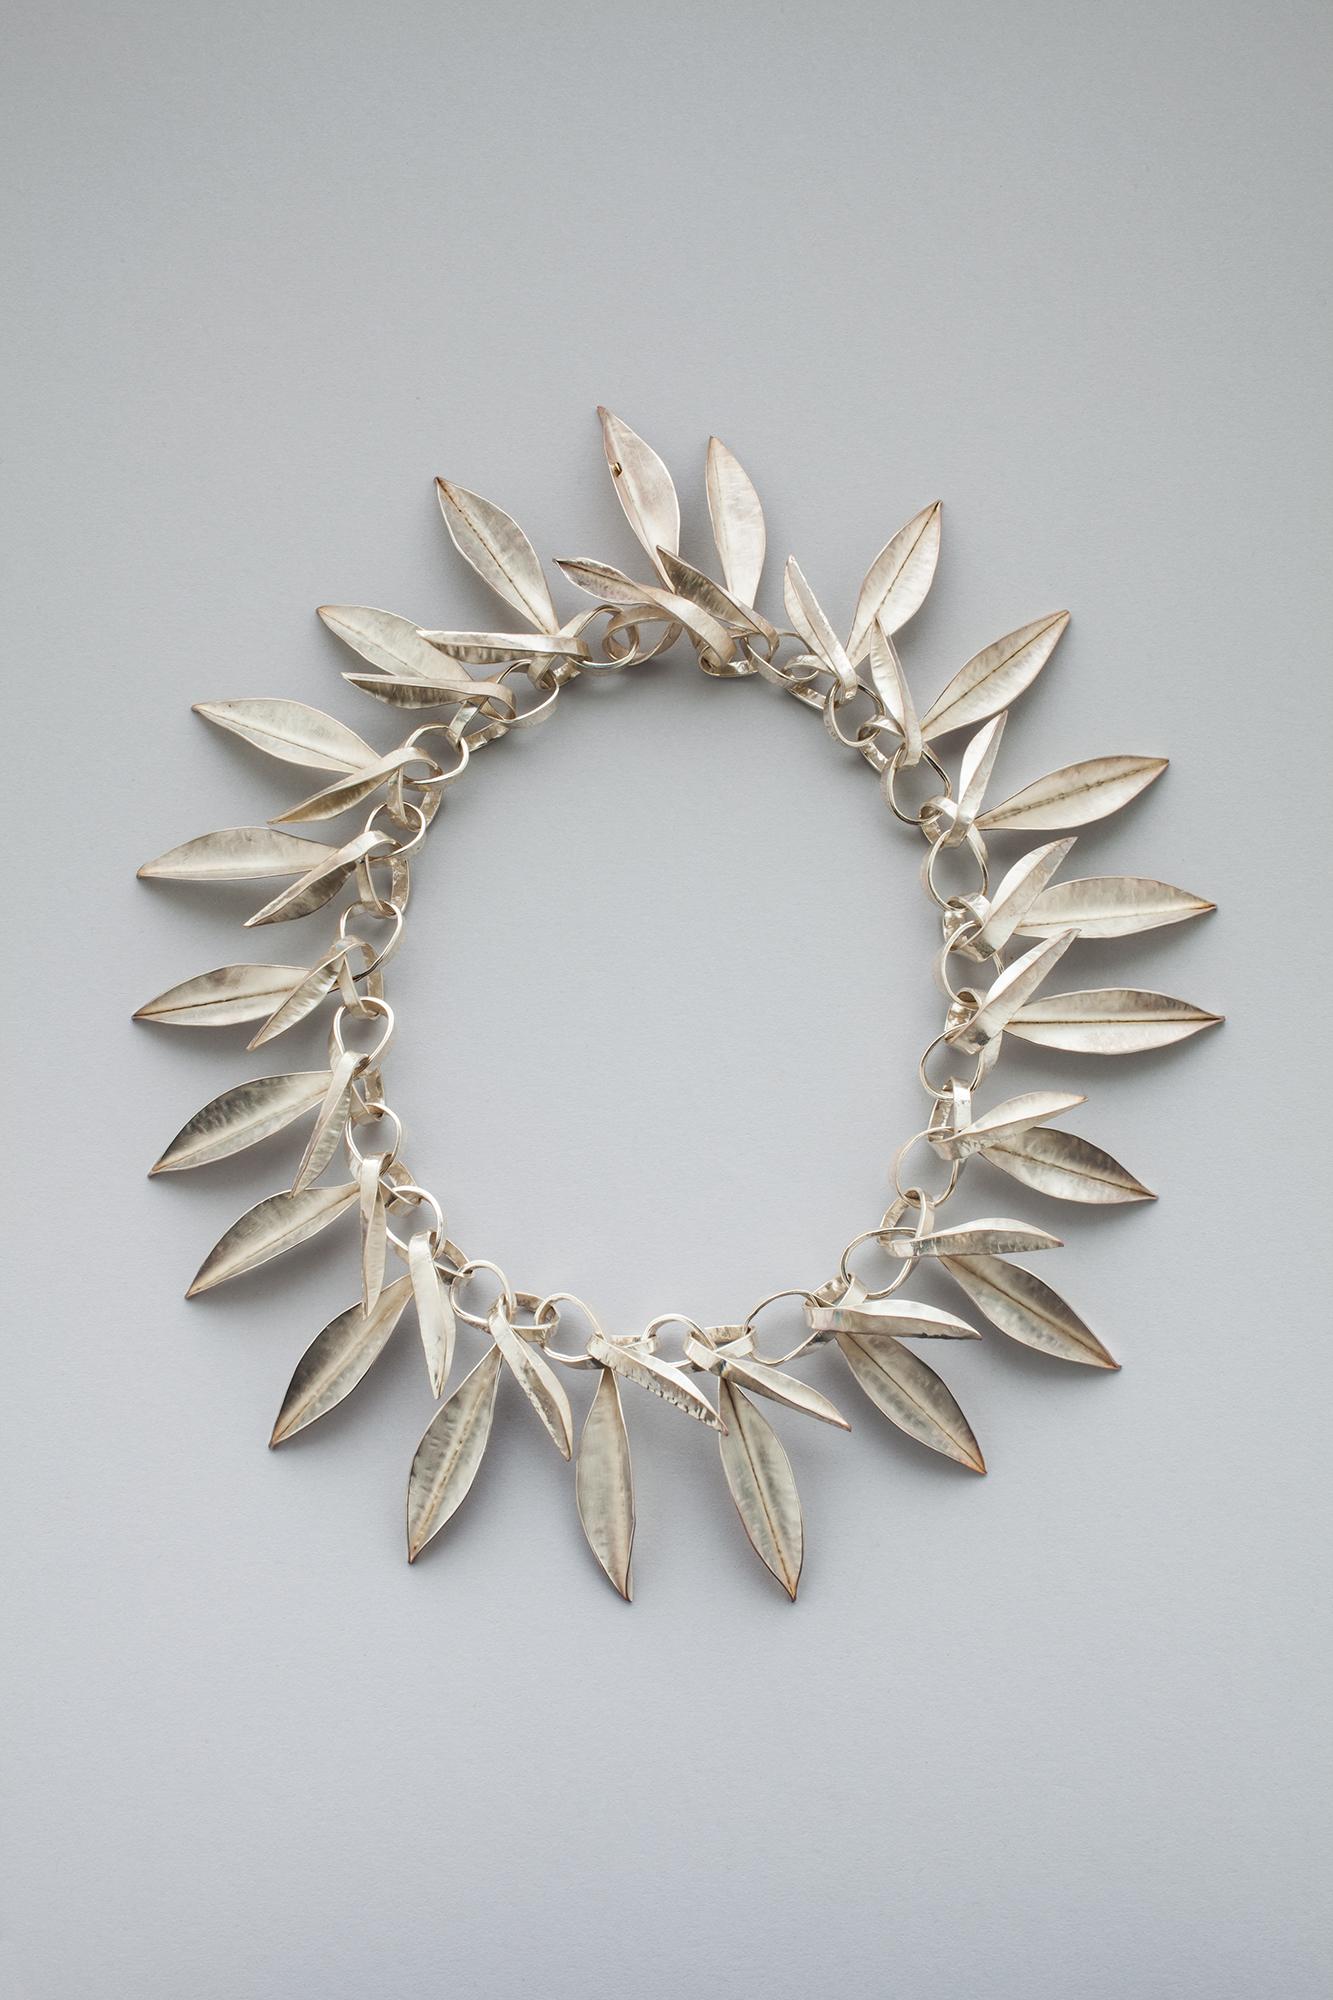 Laurel Wreath necklace